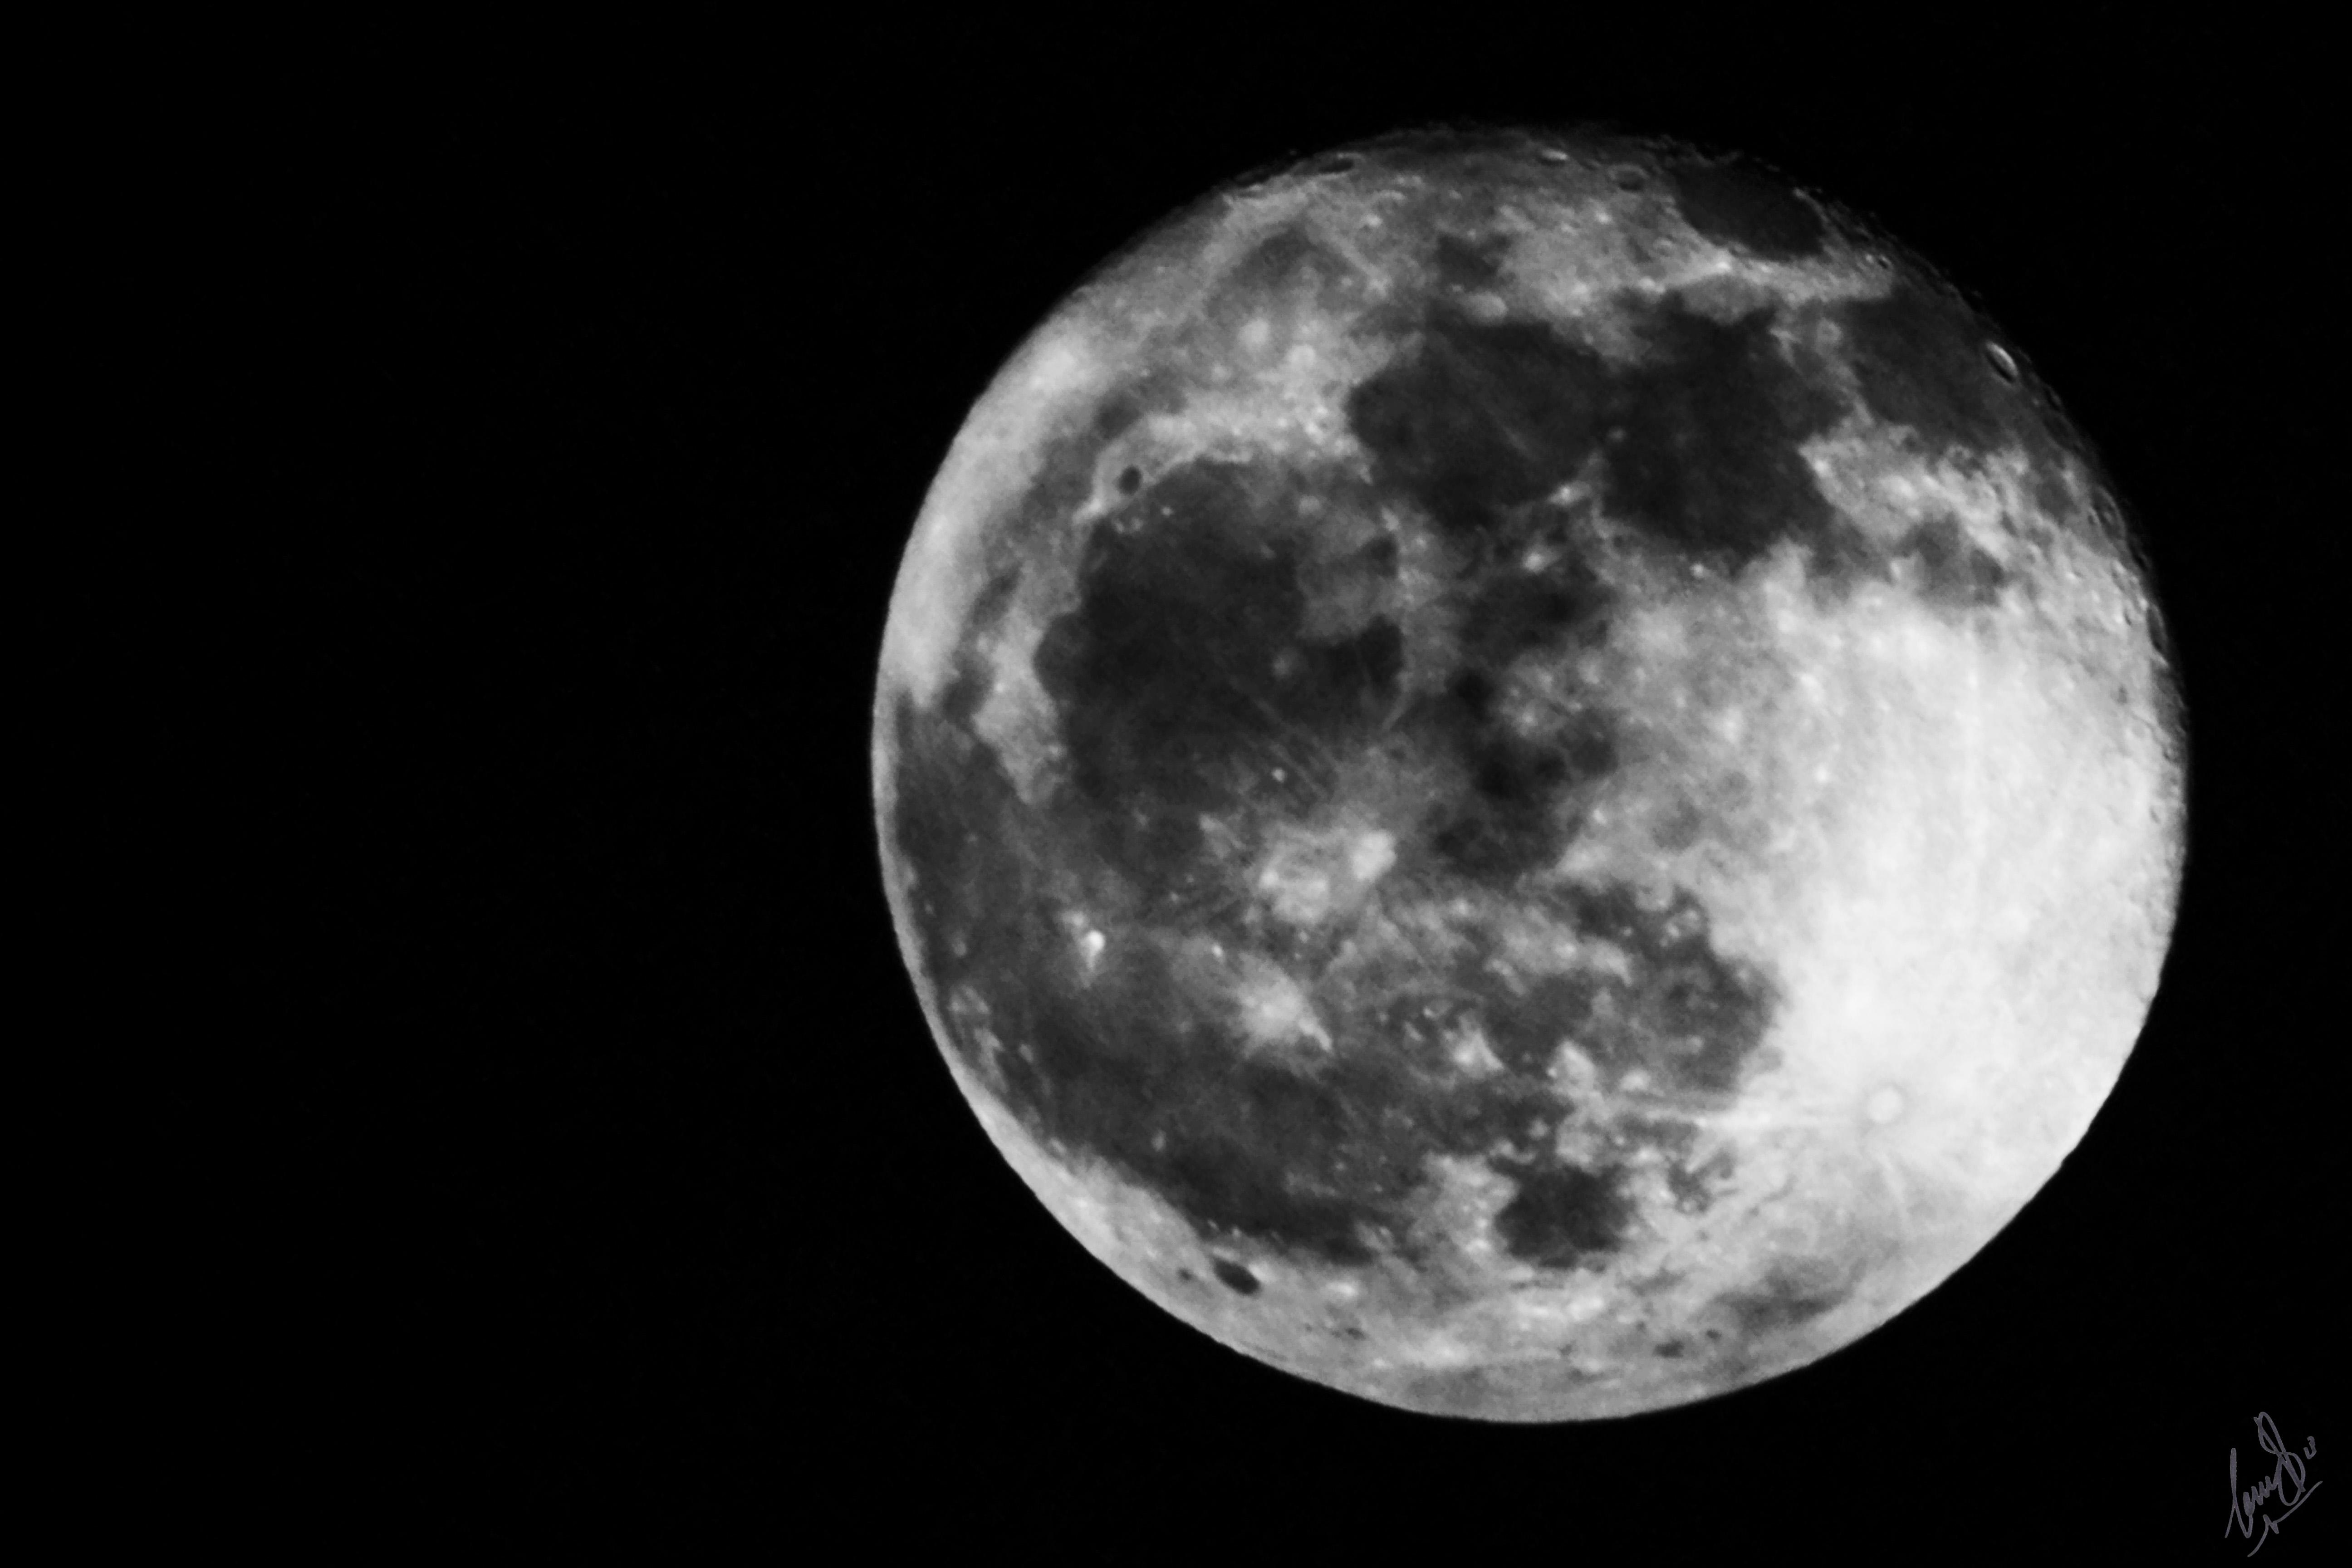 Waning Gibbous Moon 080917, Lunar, Monochrome, Moon, Night, HQ Photo